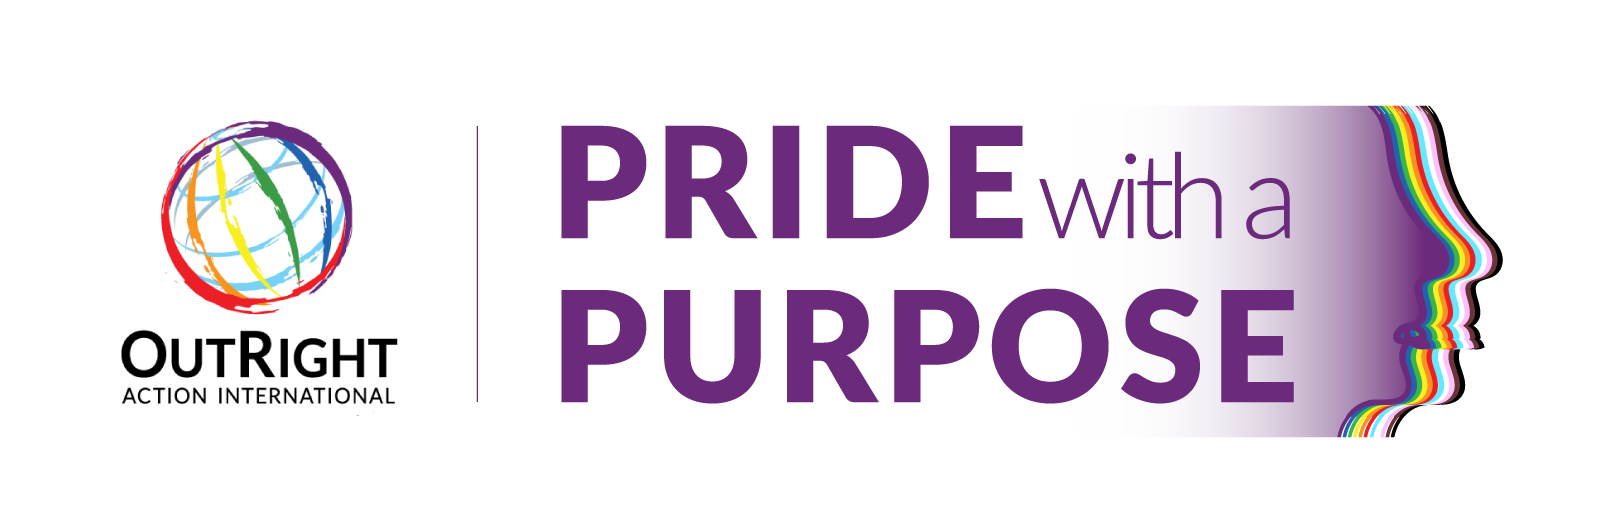 Pride With a Purpose